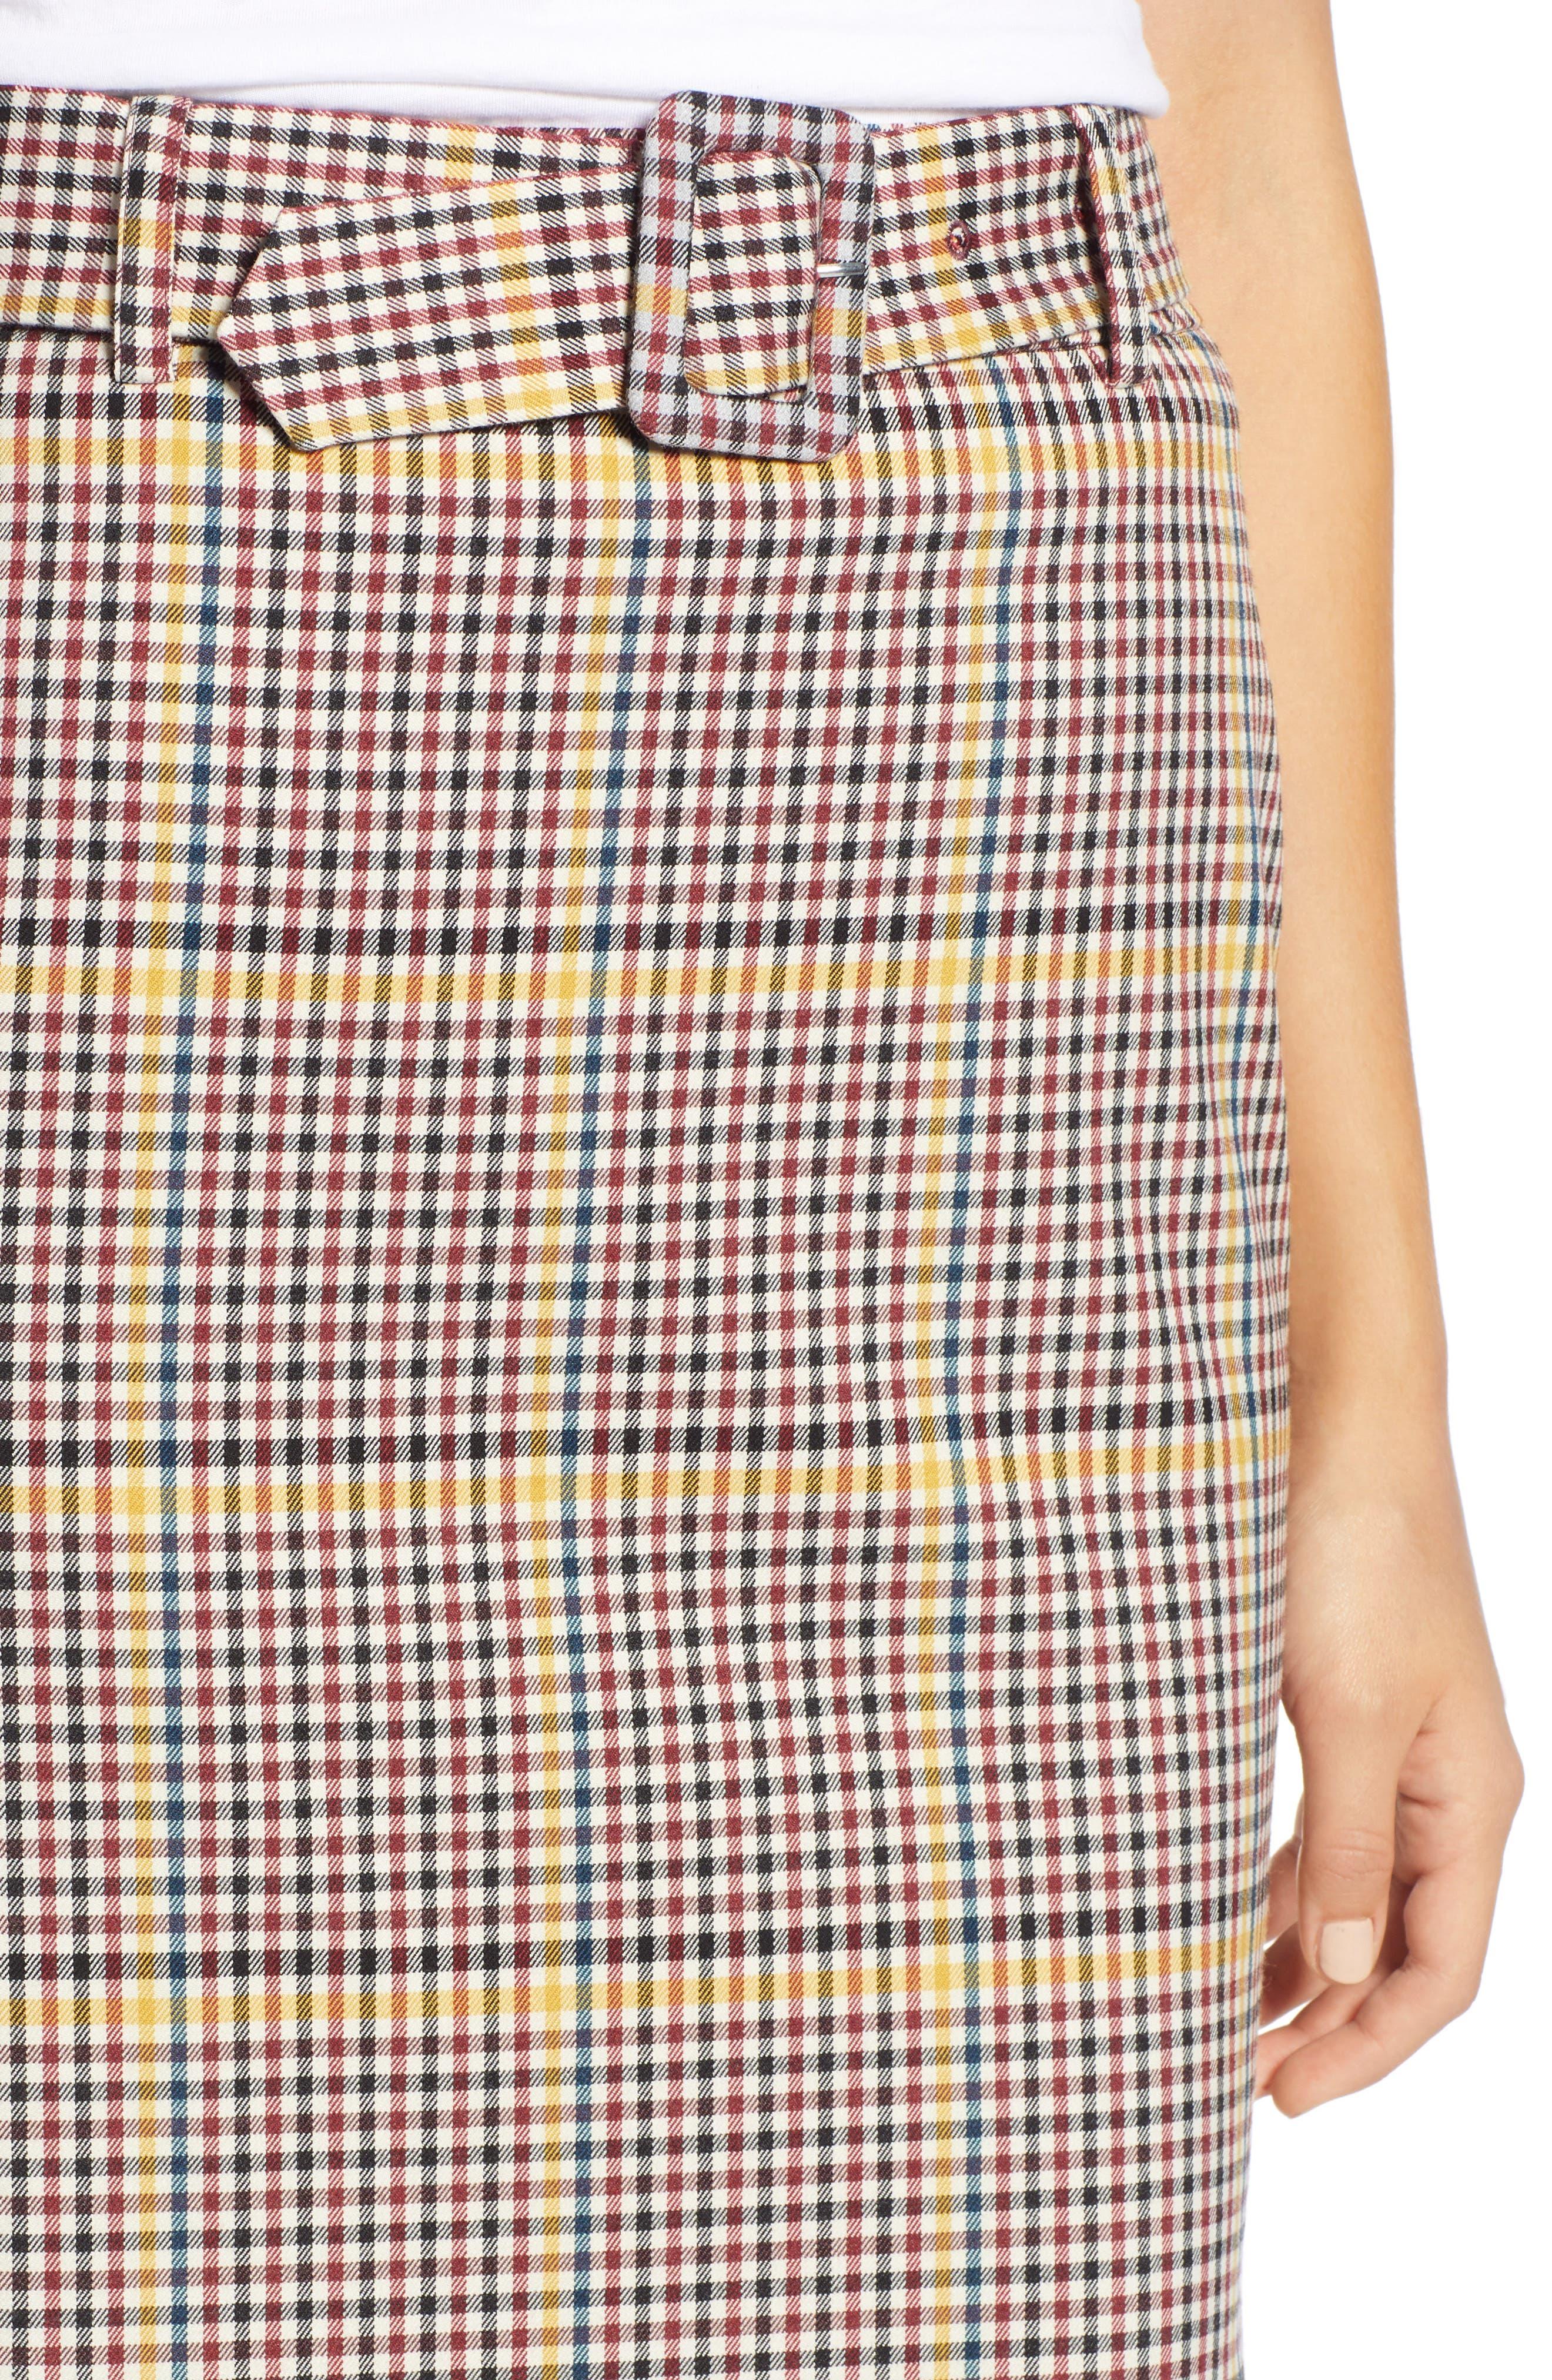 Plaid Pencil Skirt,                             Alternate thumbnail 4, color,                             601